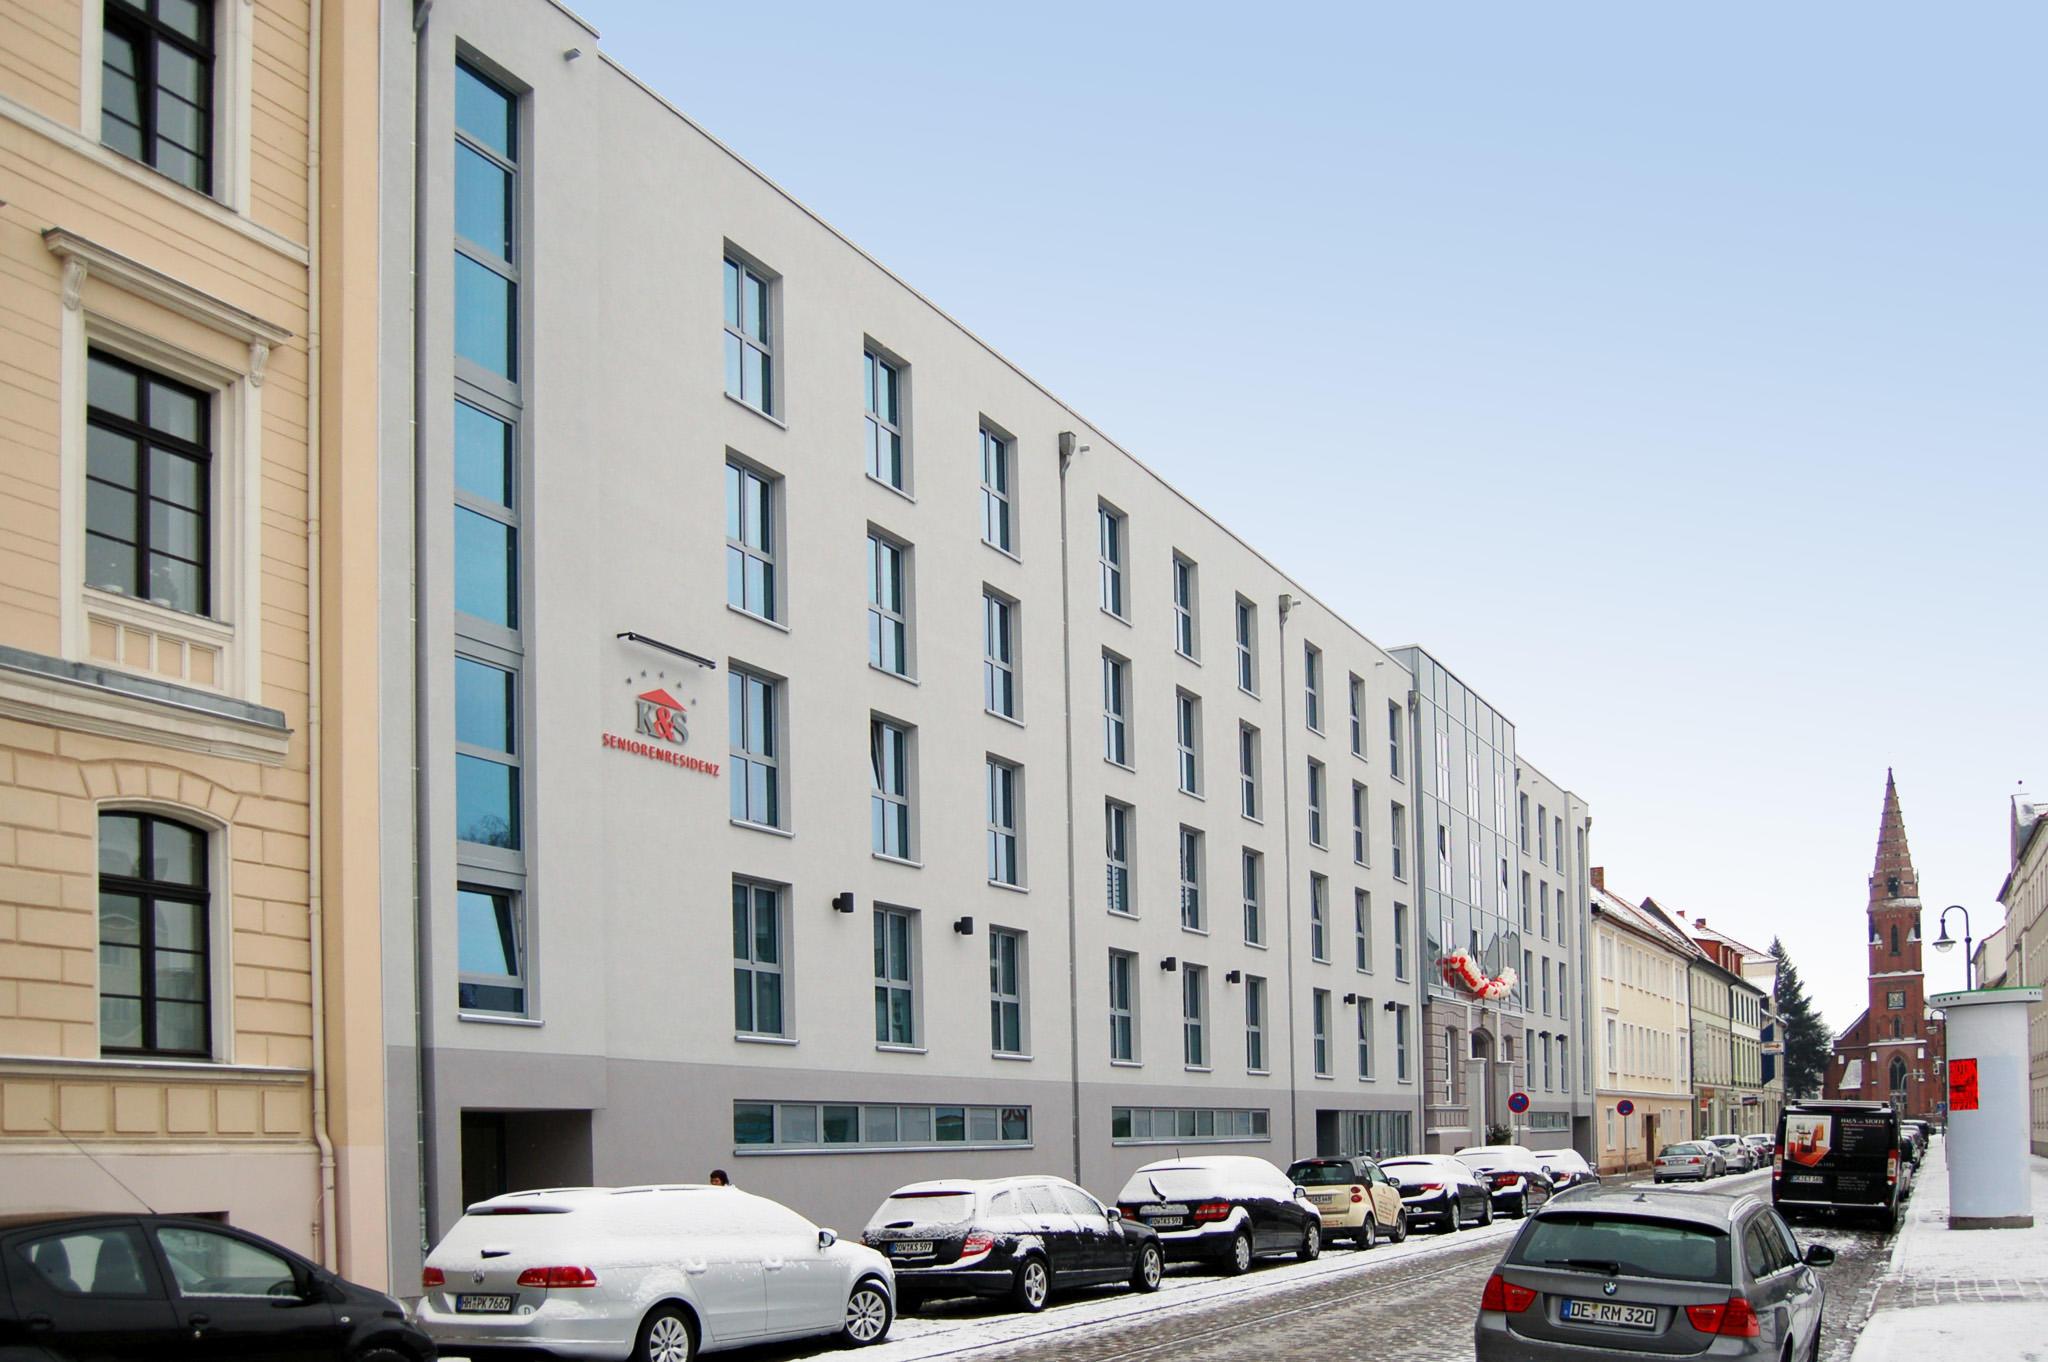 K&S Seniorenresidenz Dessau